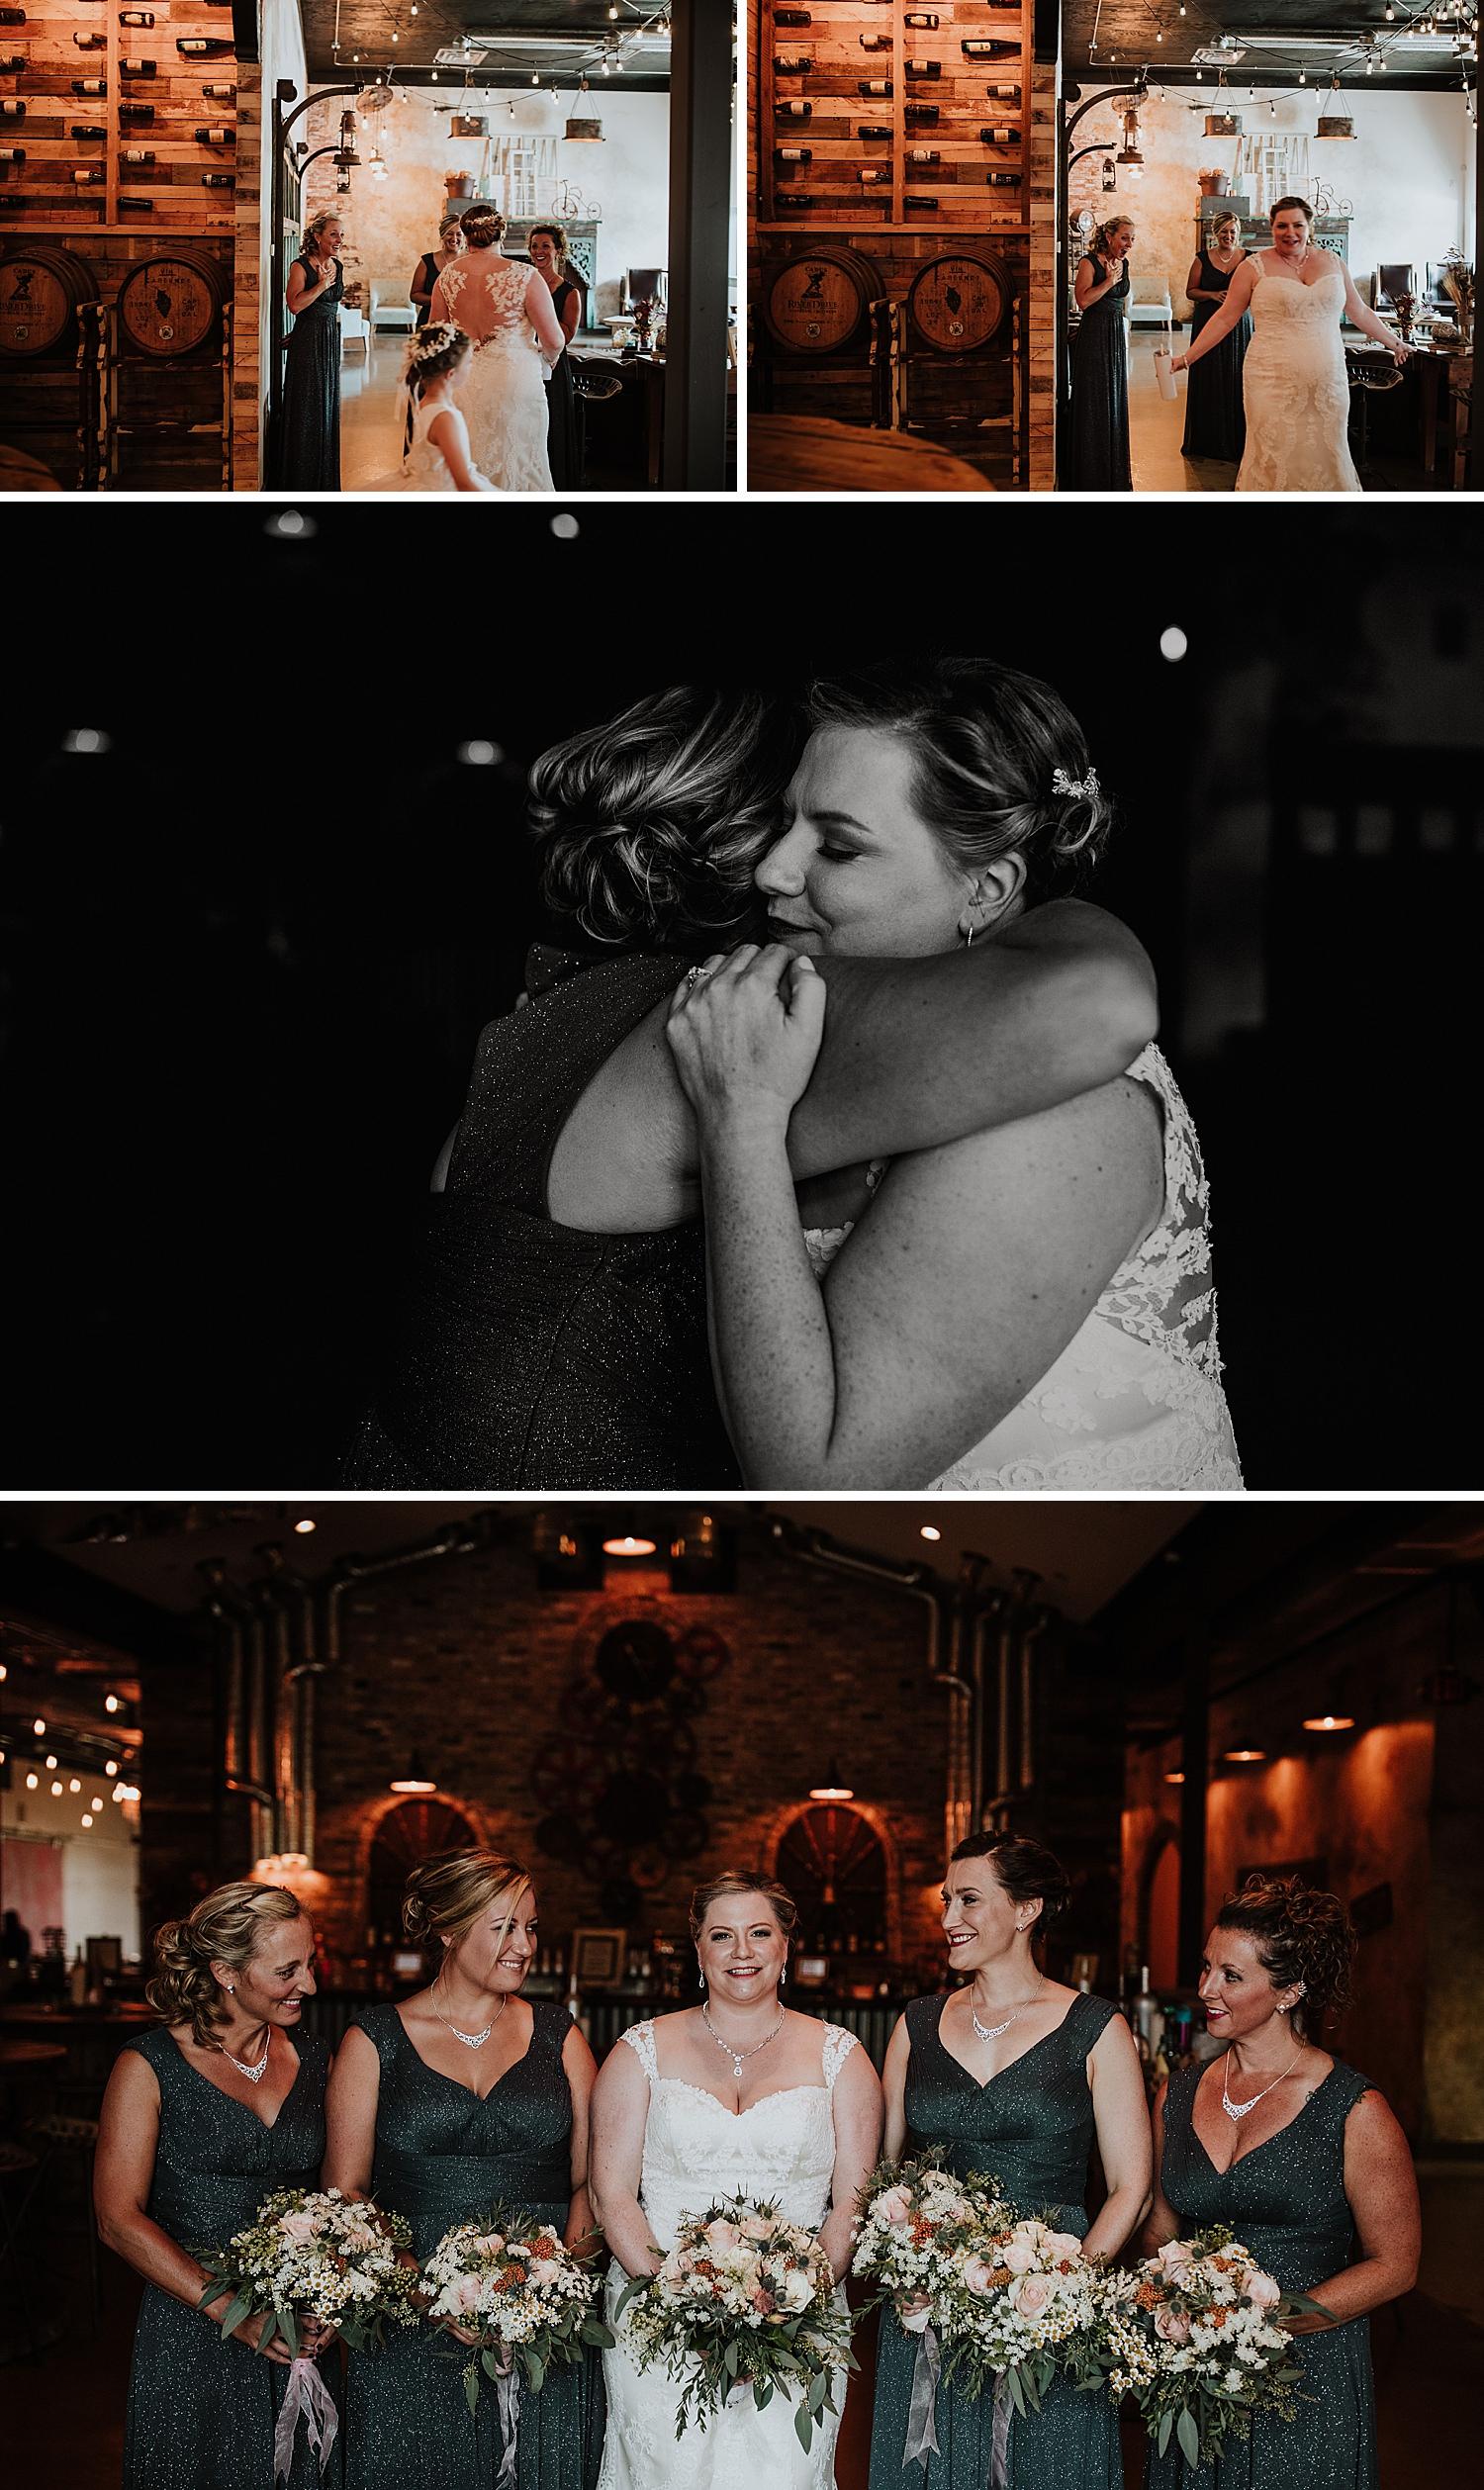 Terrace-167-Documentary-Wedding-Photographer_0005.jpg